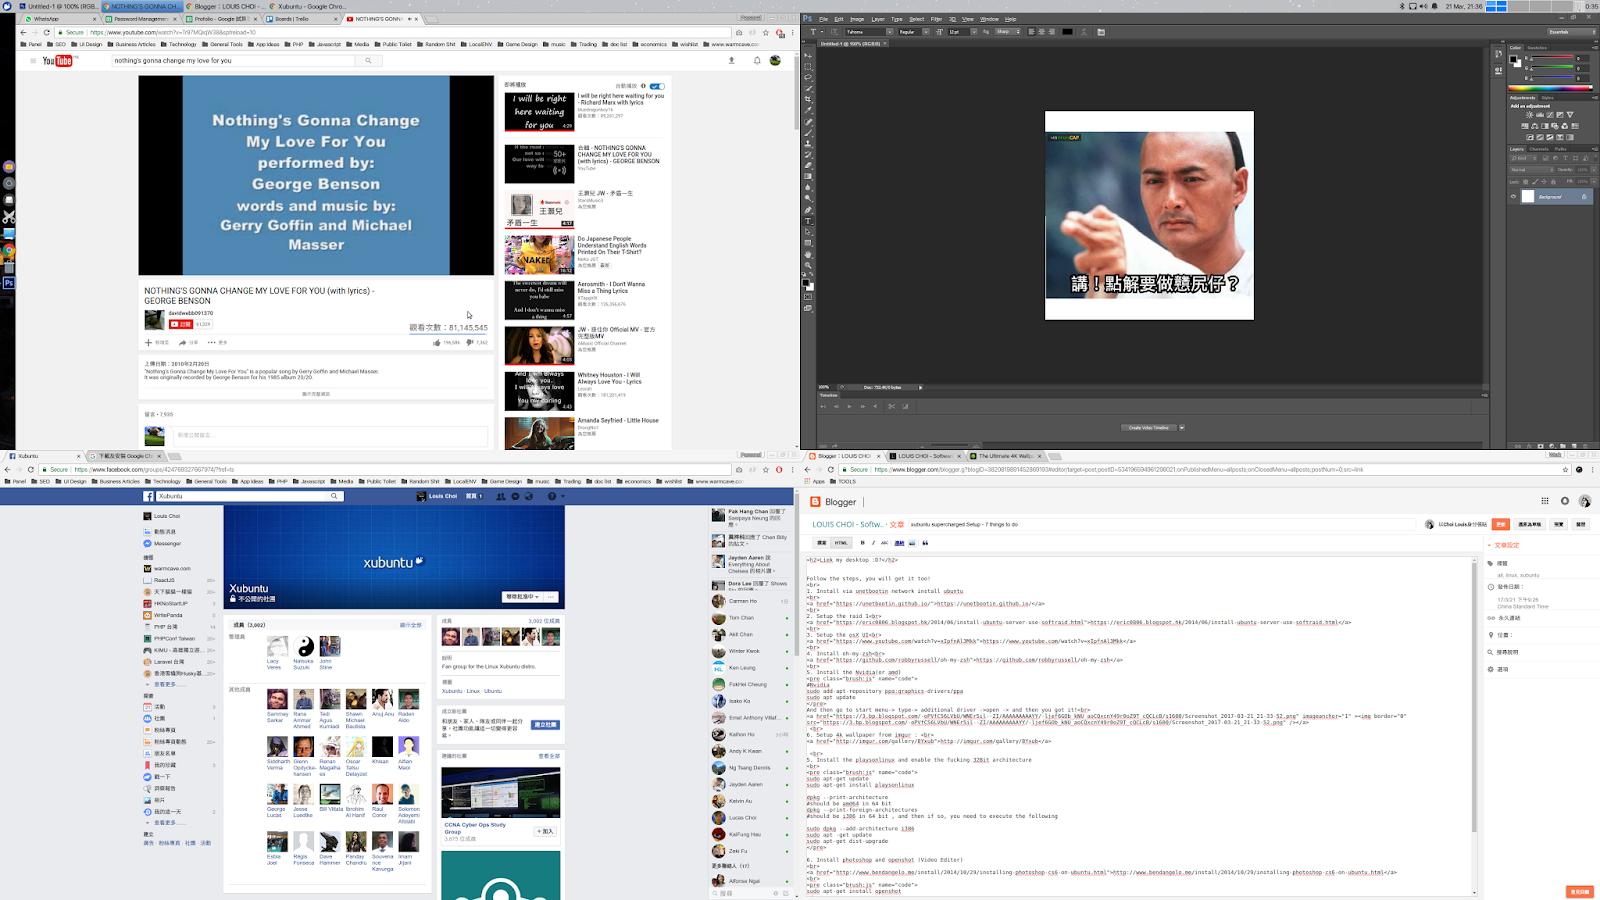 LOUIS CHOI - Software Developer - Code Block